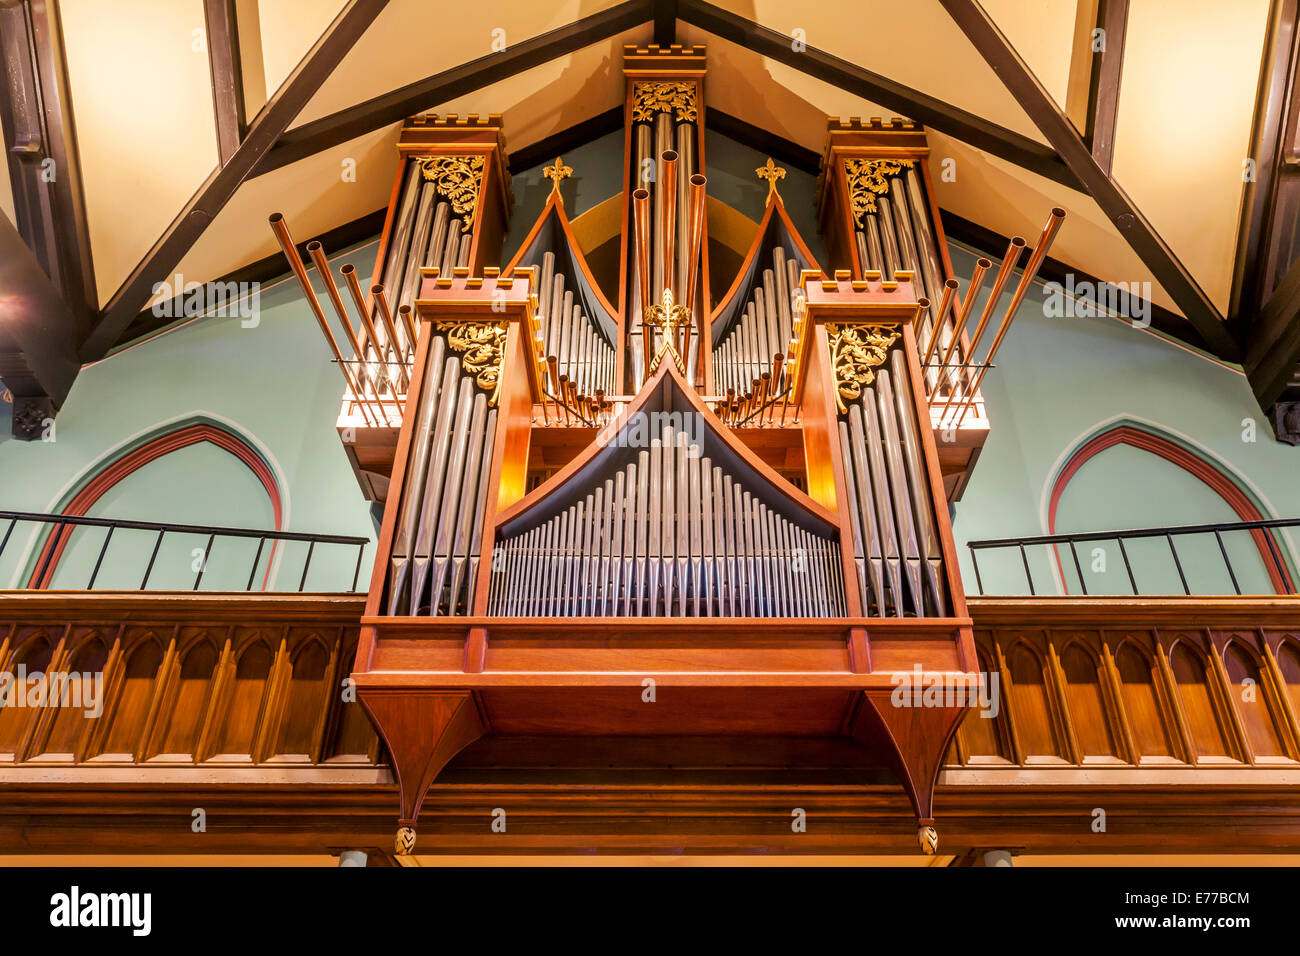 Un organo a canne in una chiesa. Immagini Stock